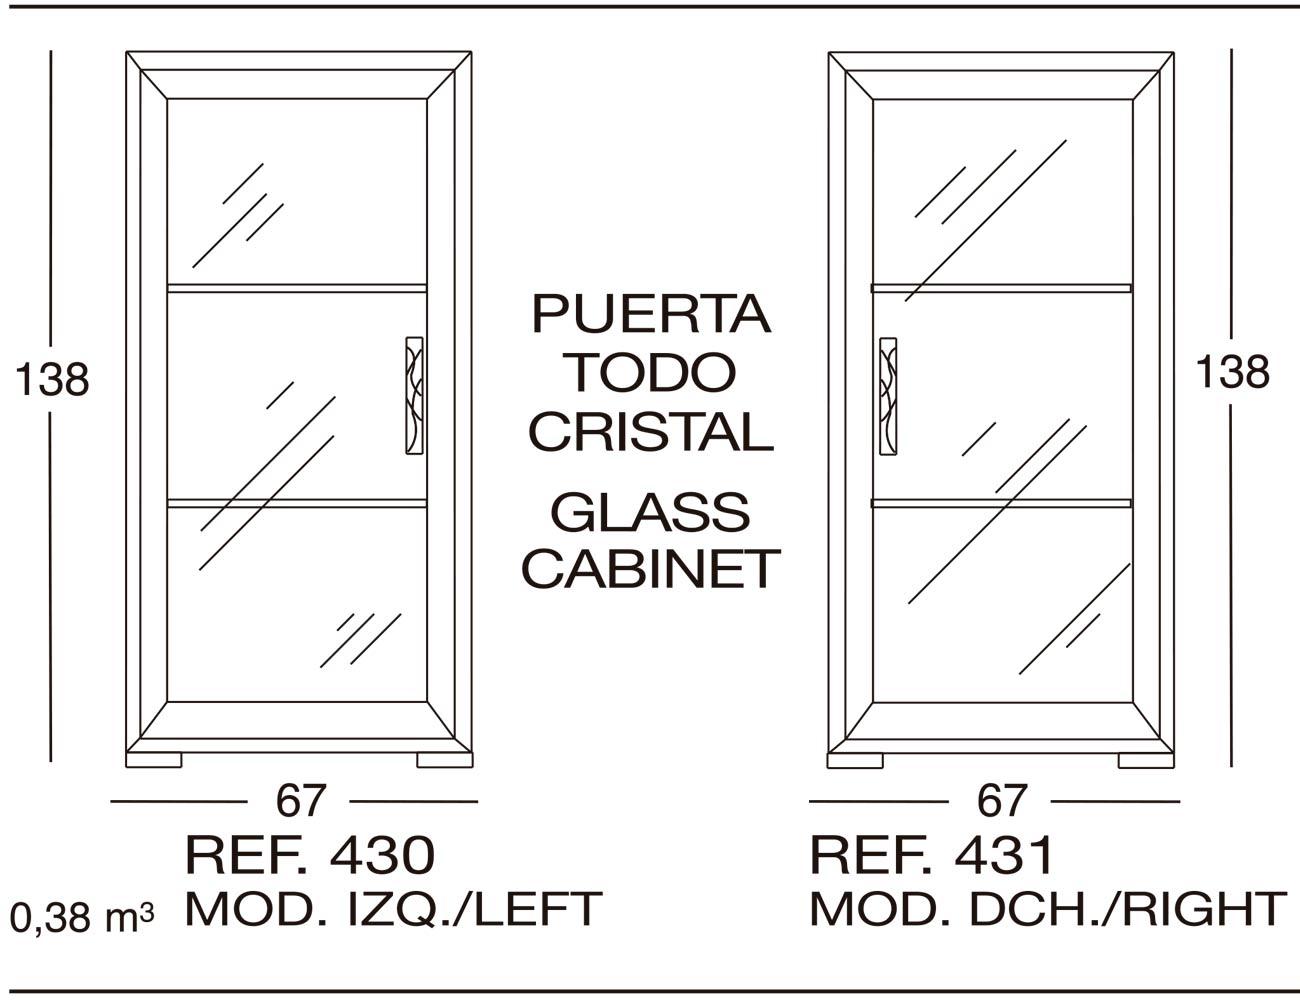 Modulo izdo puerta todo cristal 430